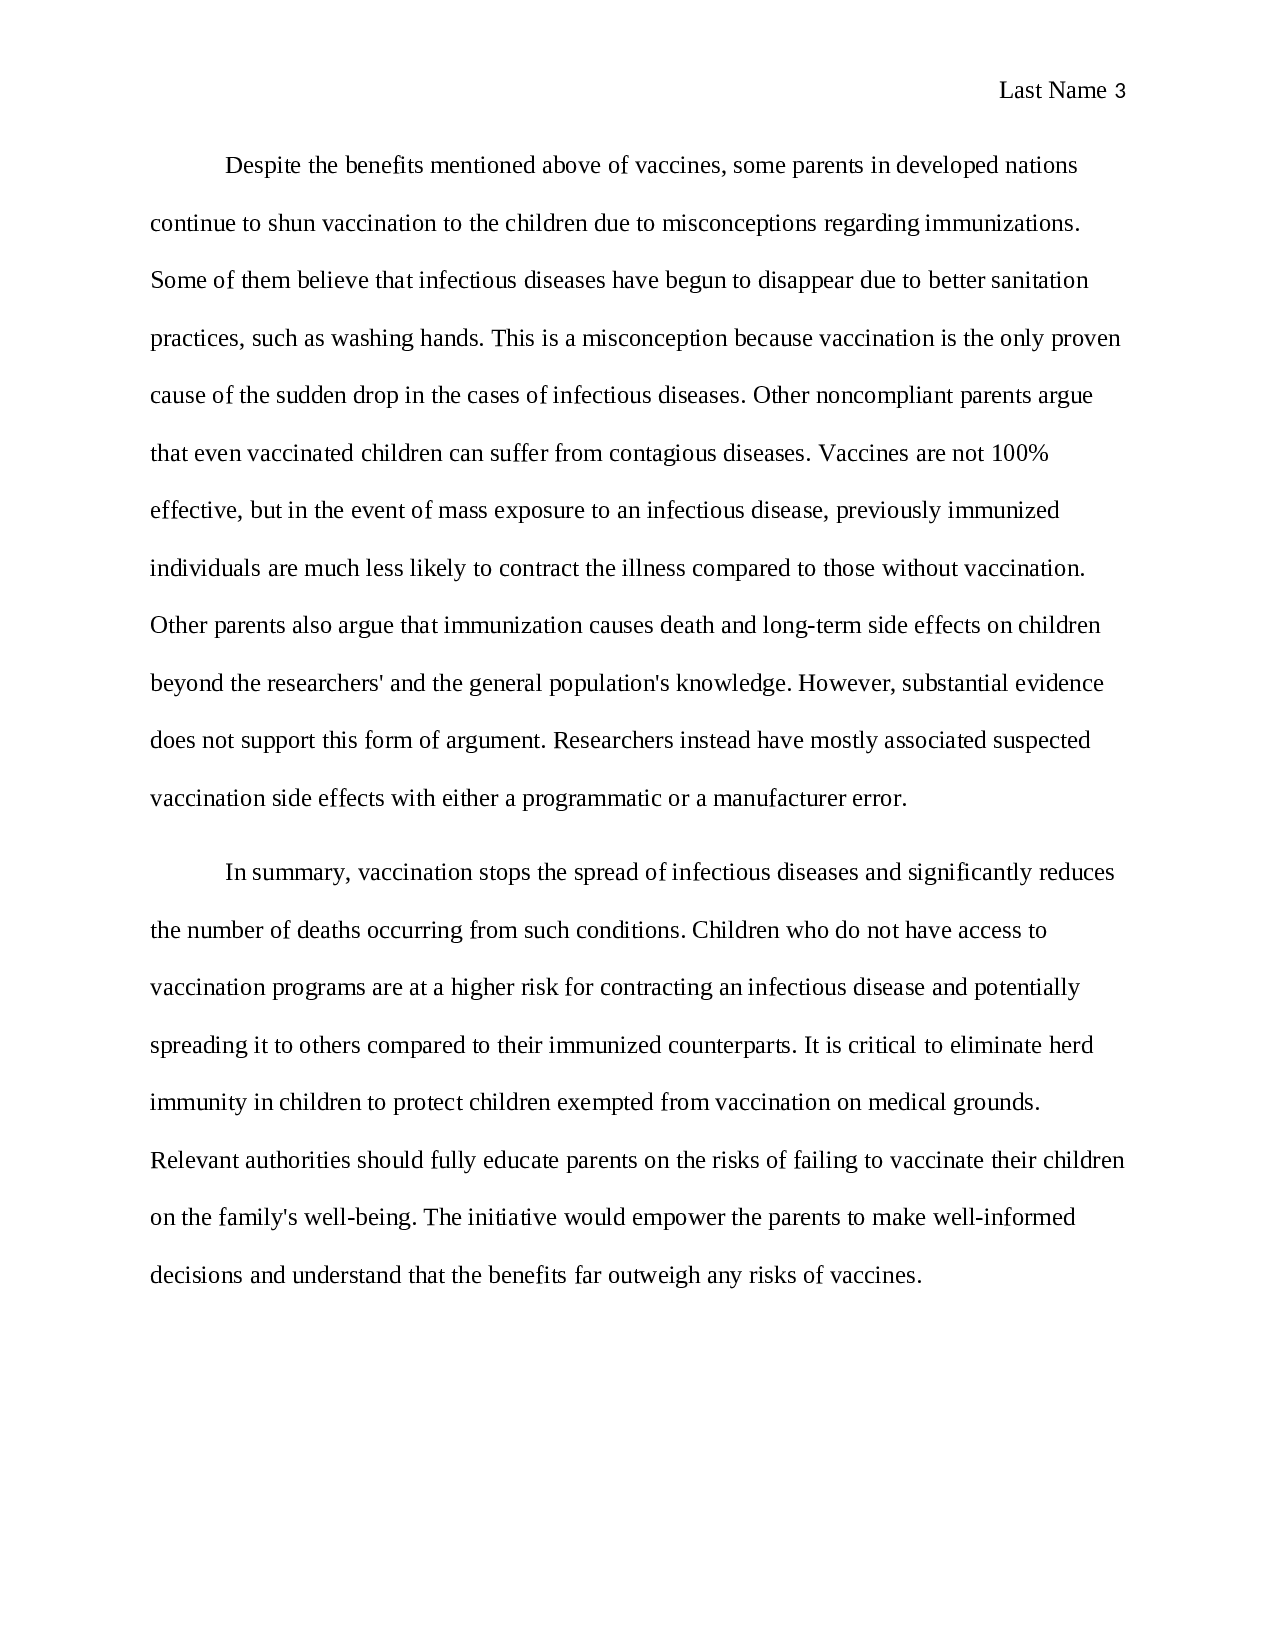 Eco friendly world essay